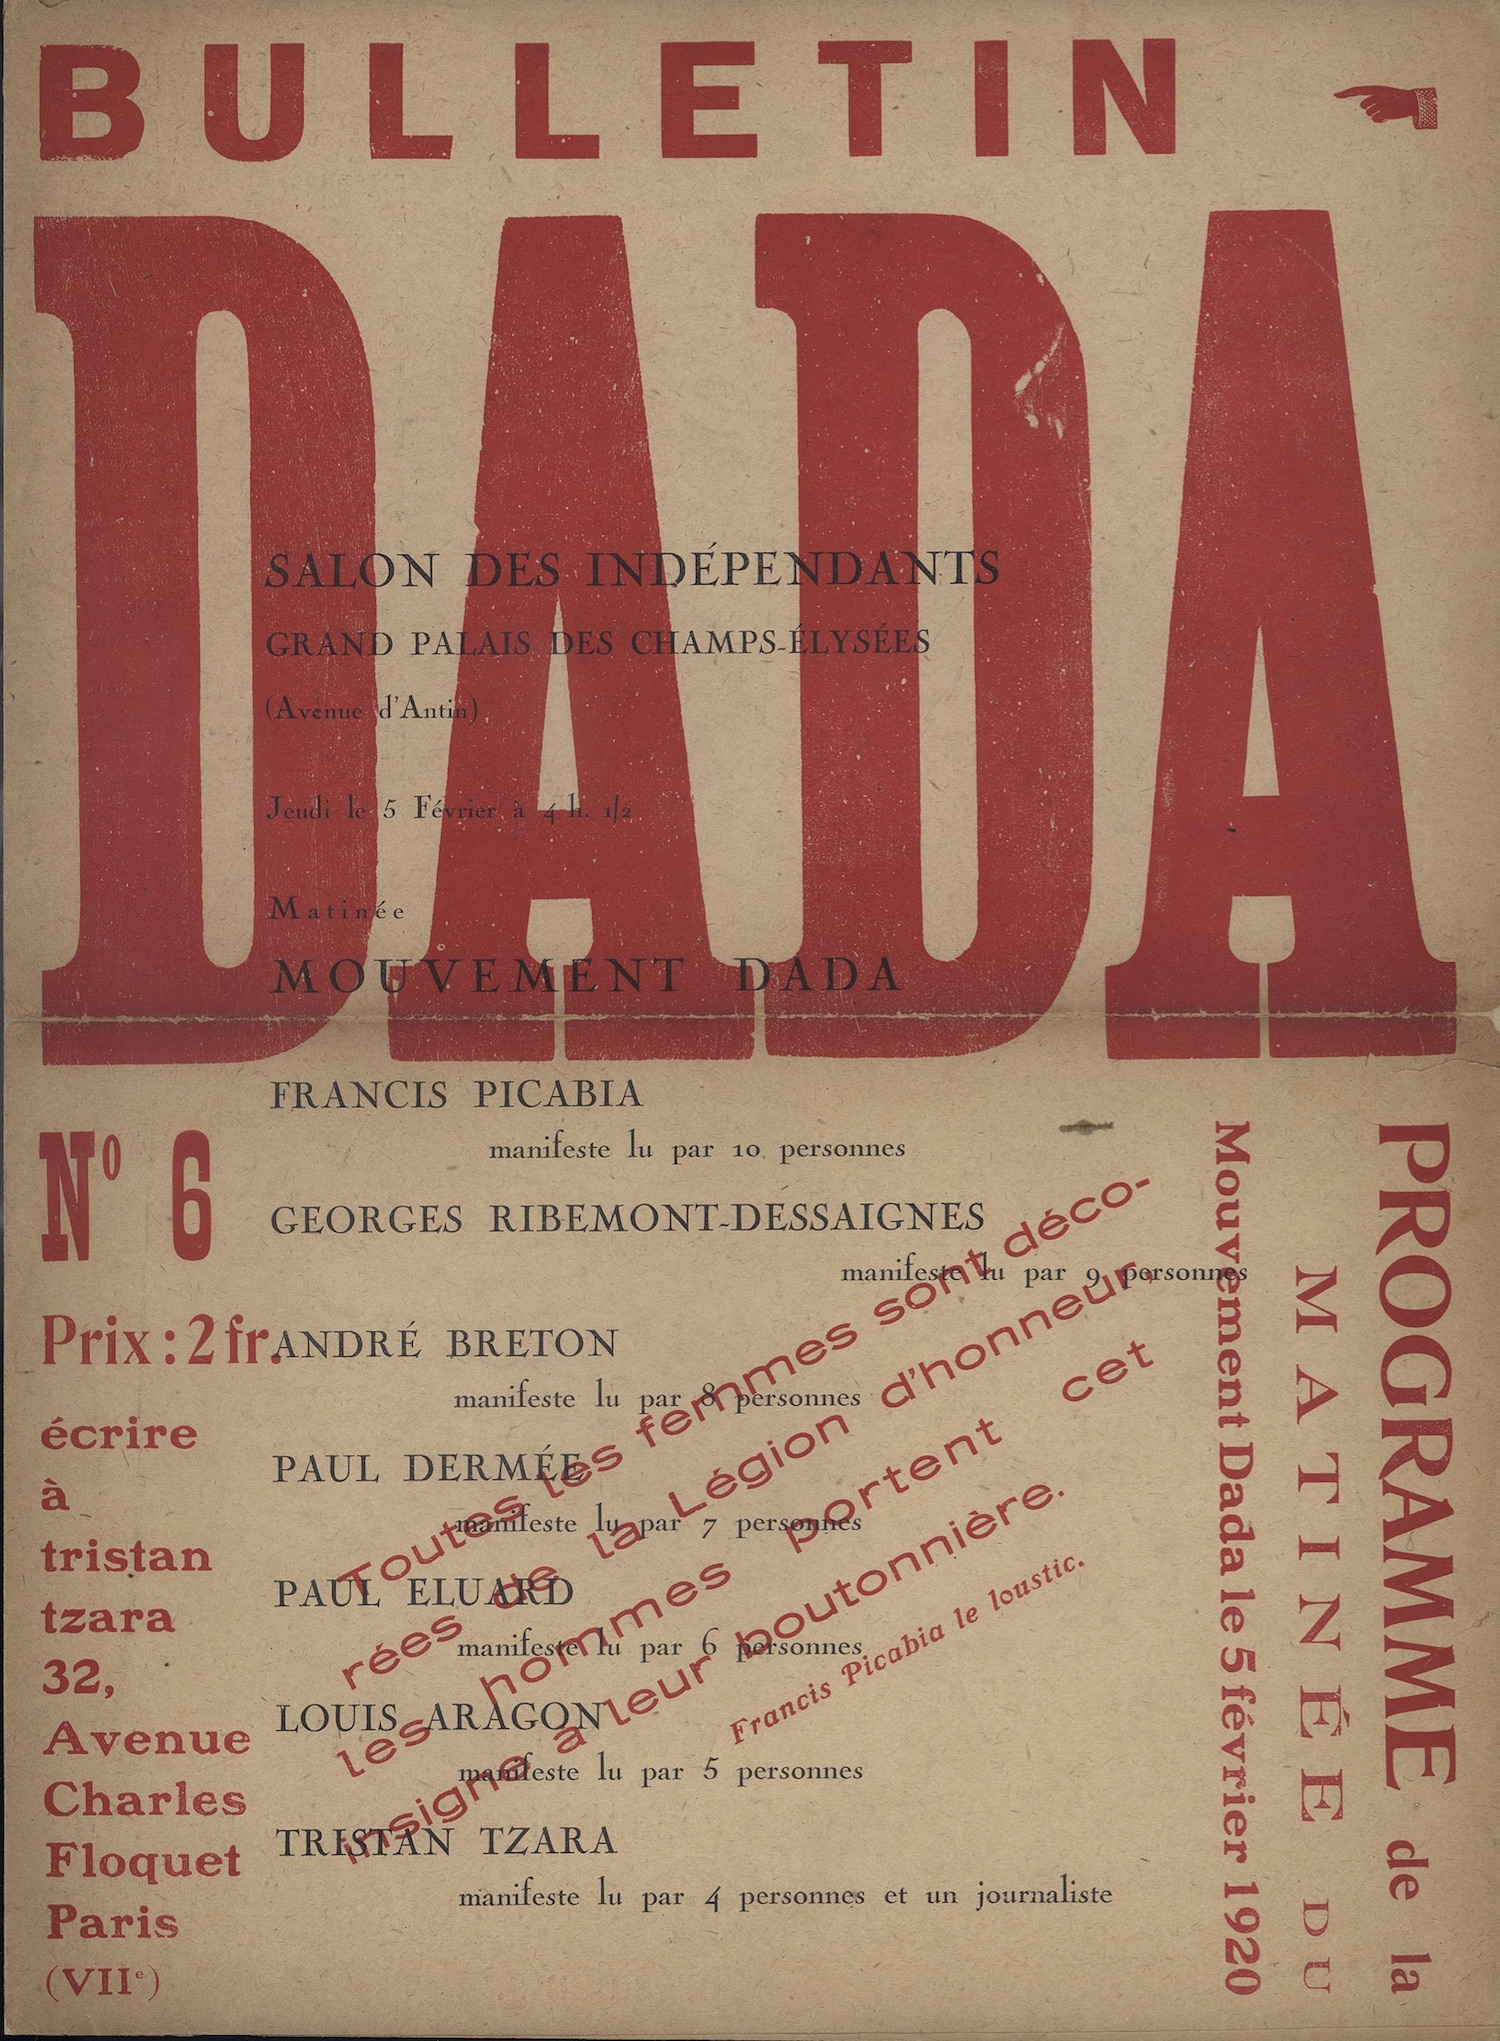 Dada6